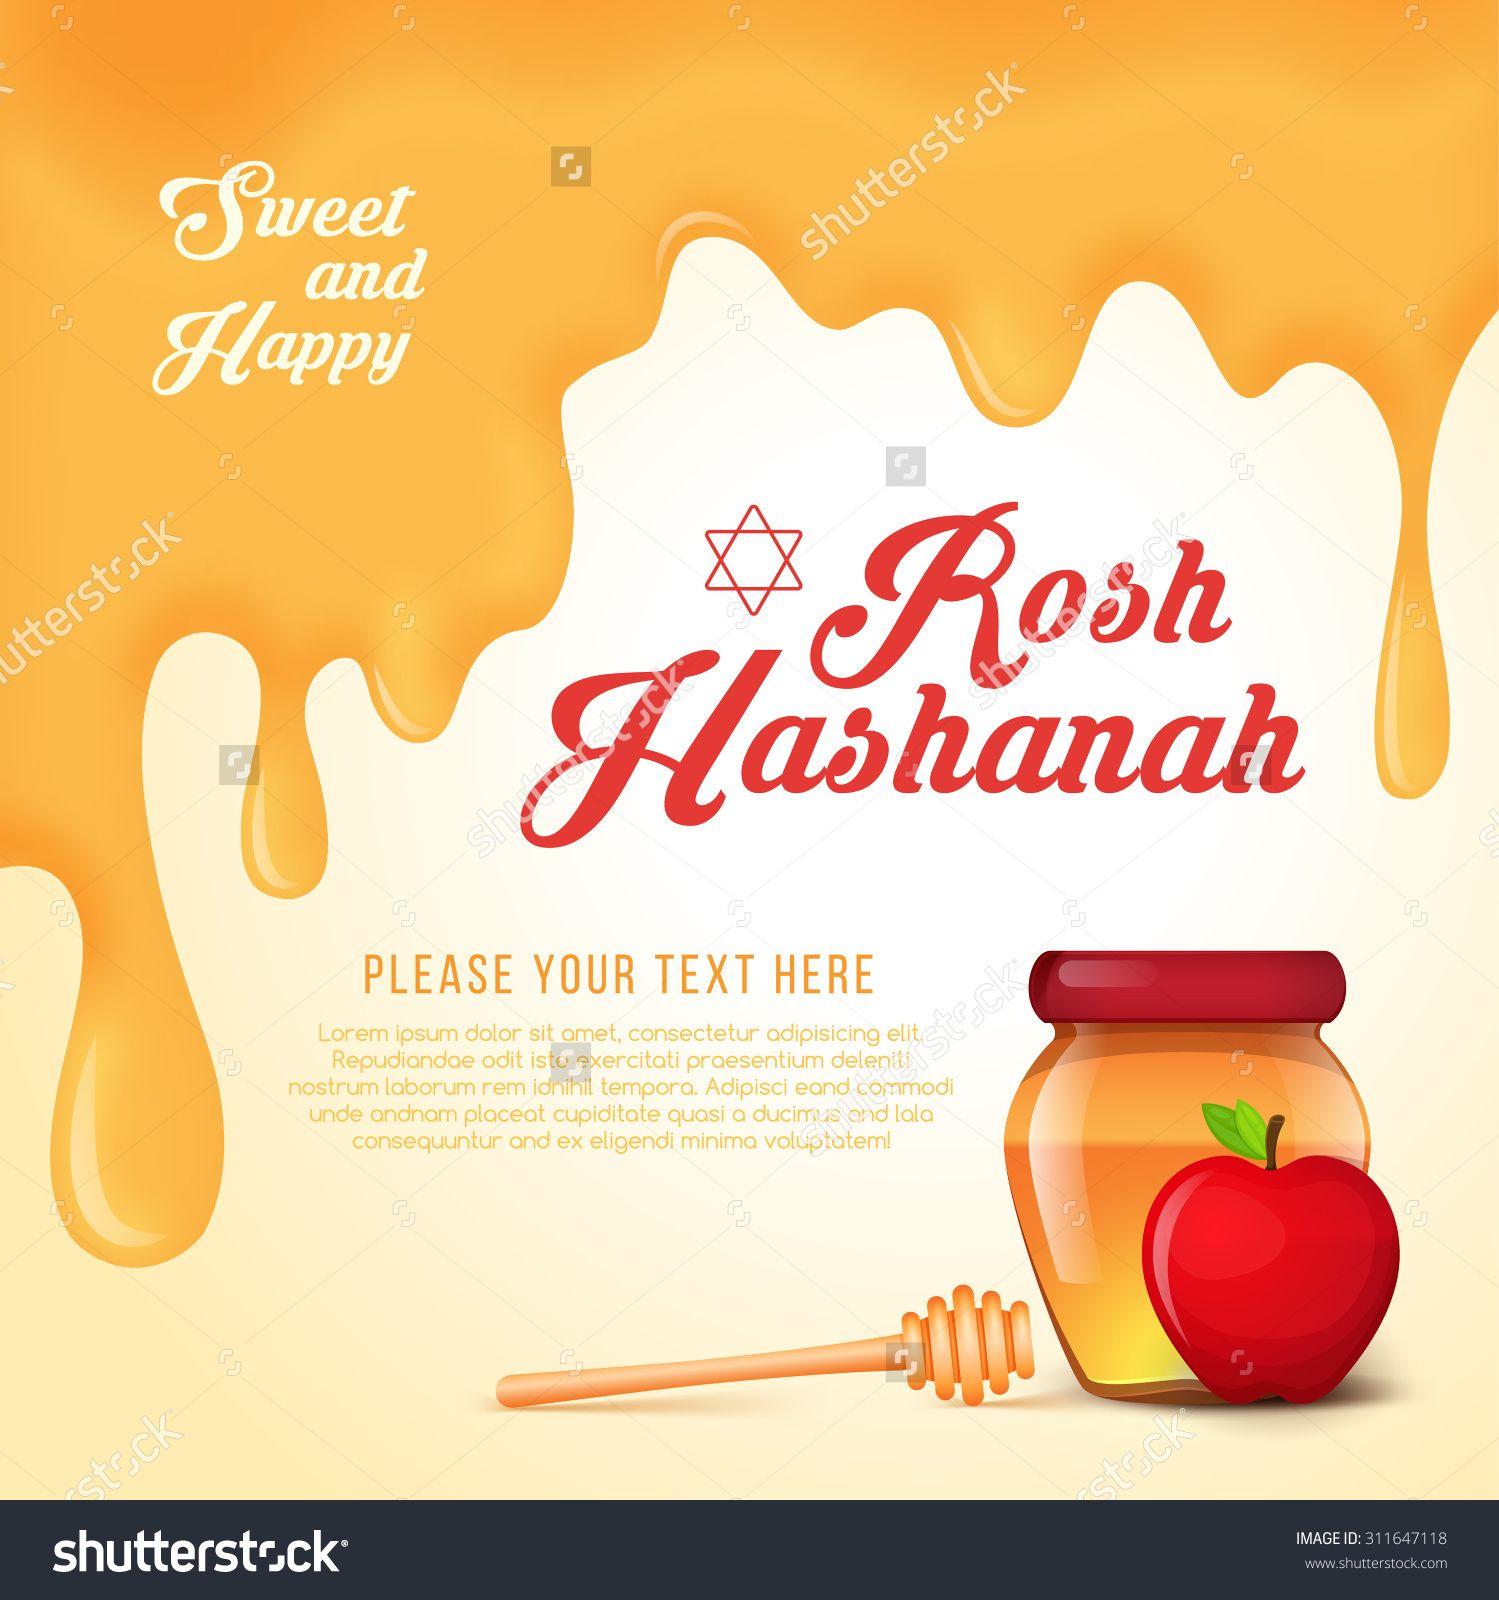 Rosh hashanah bunting google search rosh hashana decorations rosh hashanah bunting google search kristyandbryce Images